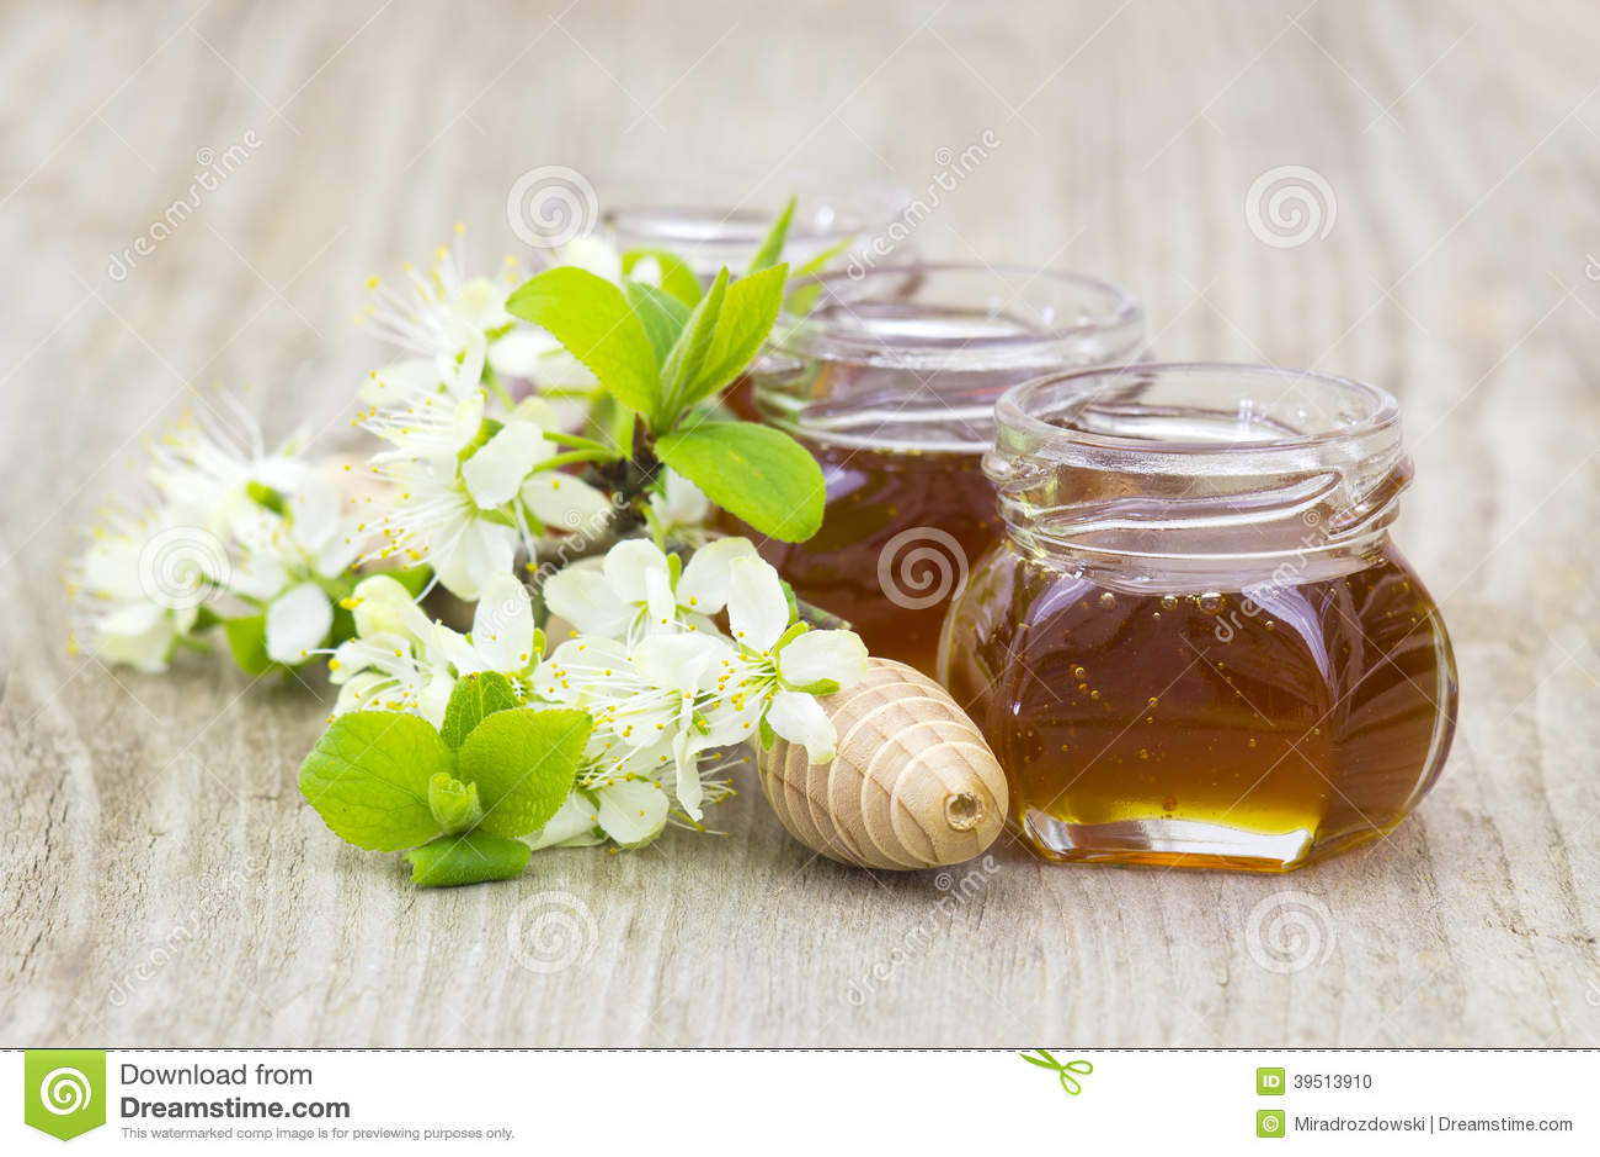 Honey in jars, flowers and honey dipper